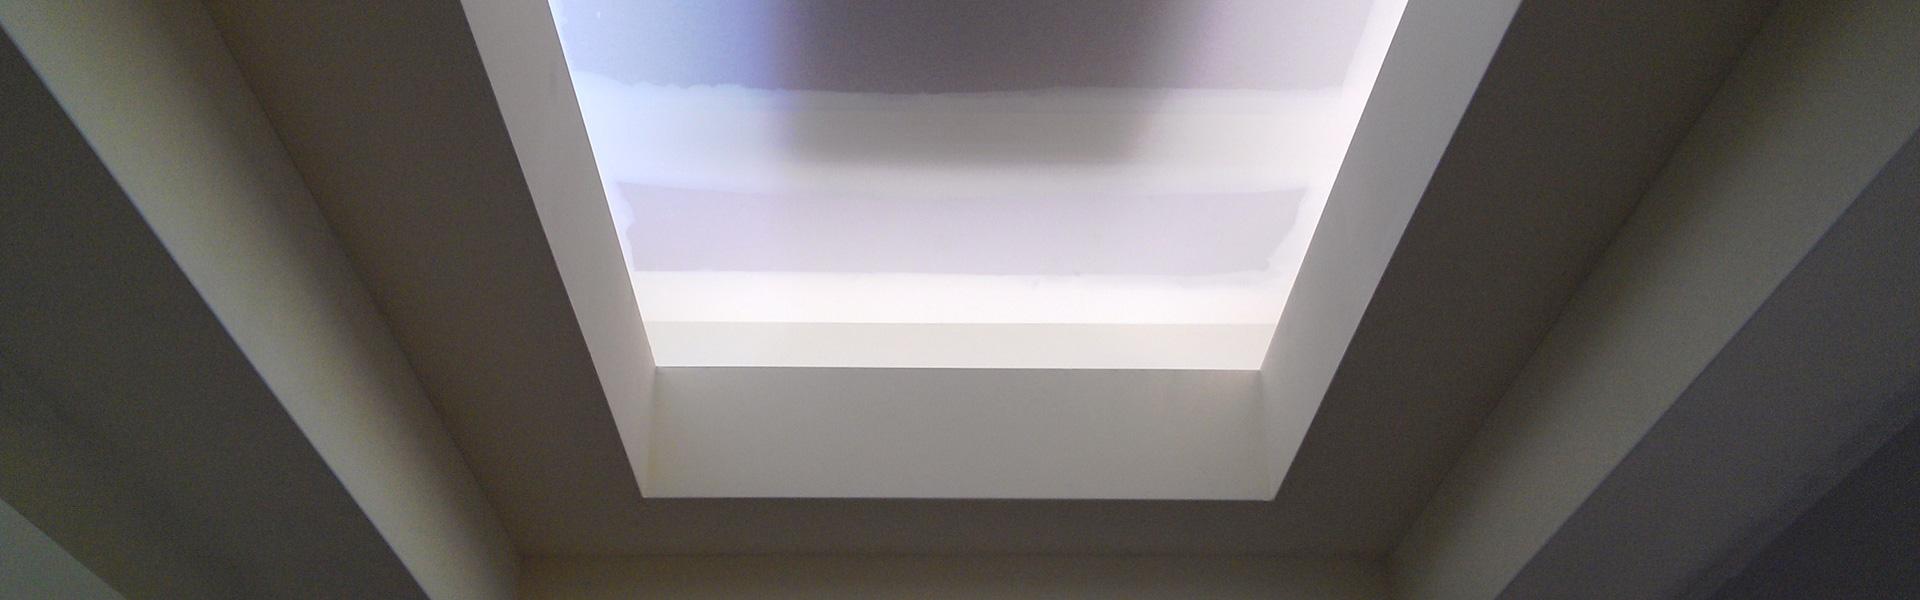 vaal-ceilings-bulk-heads